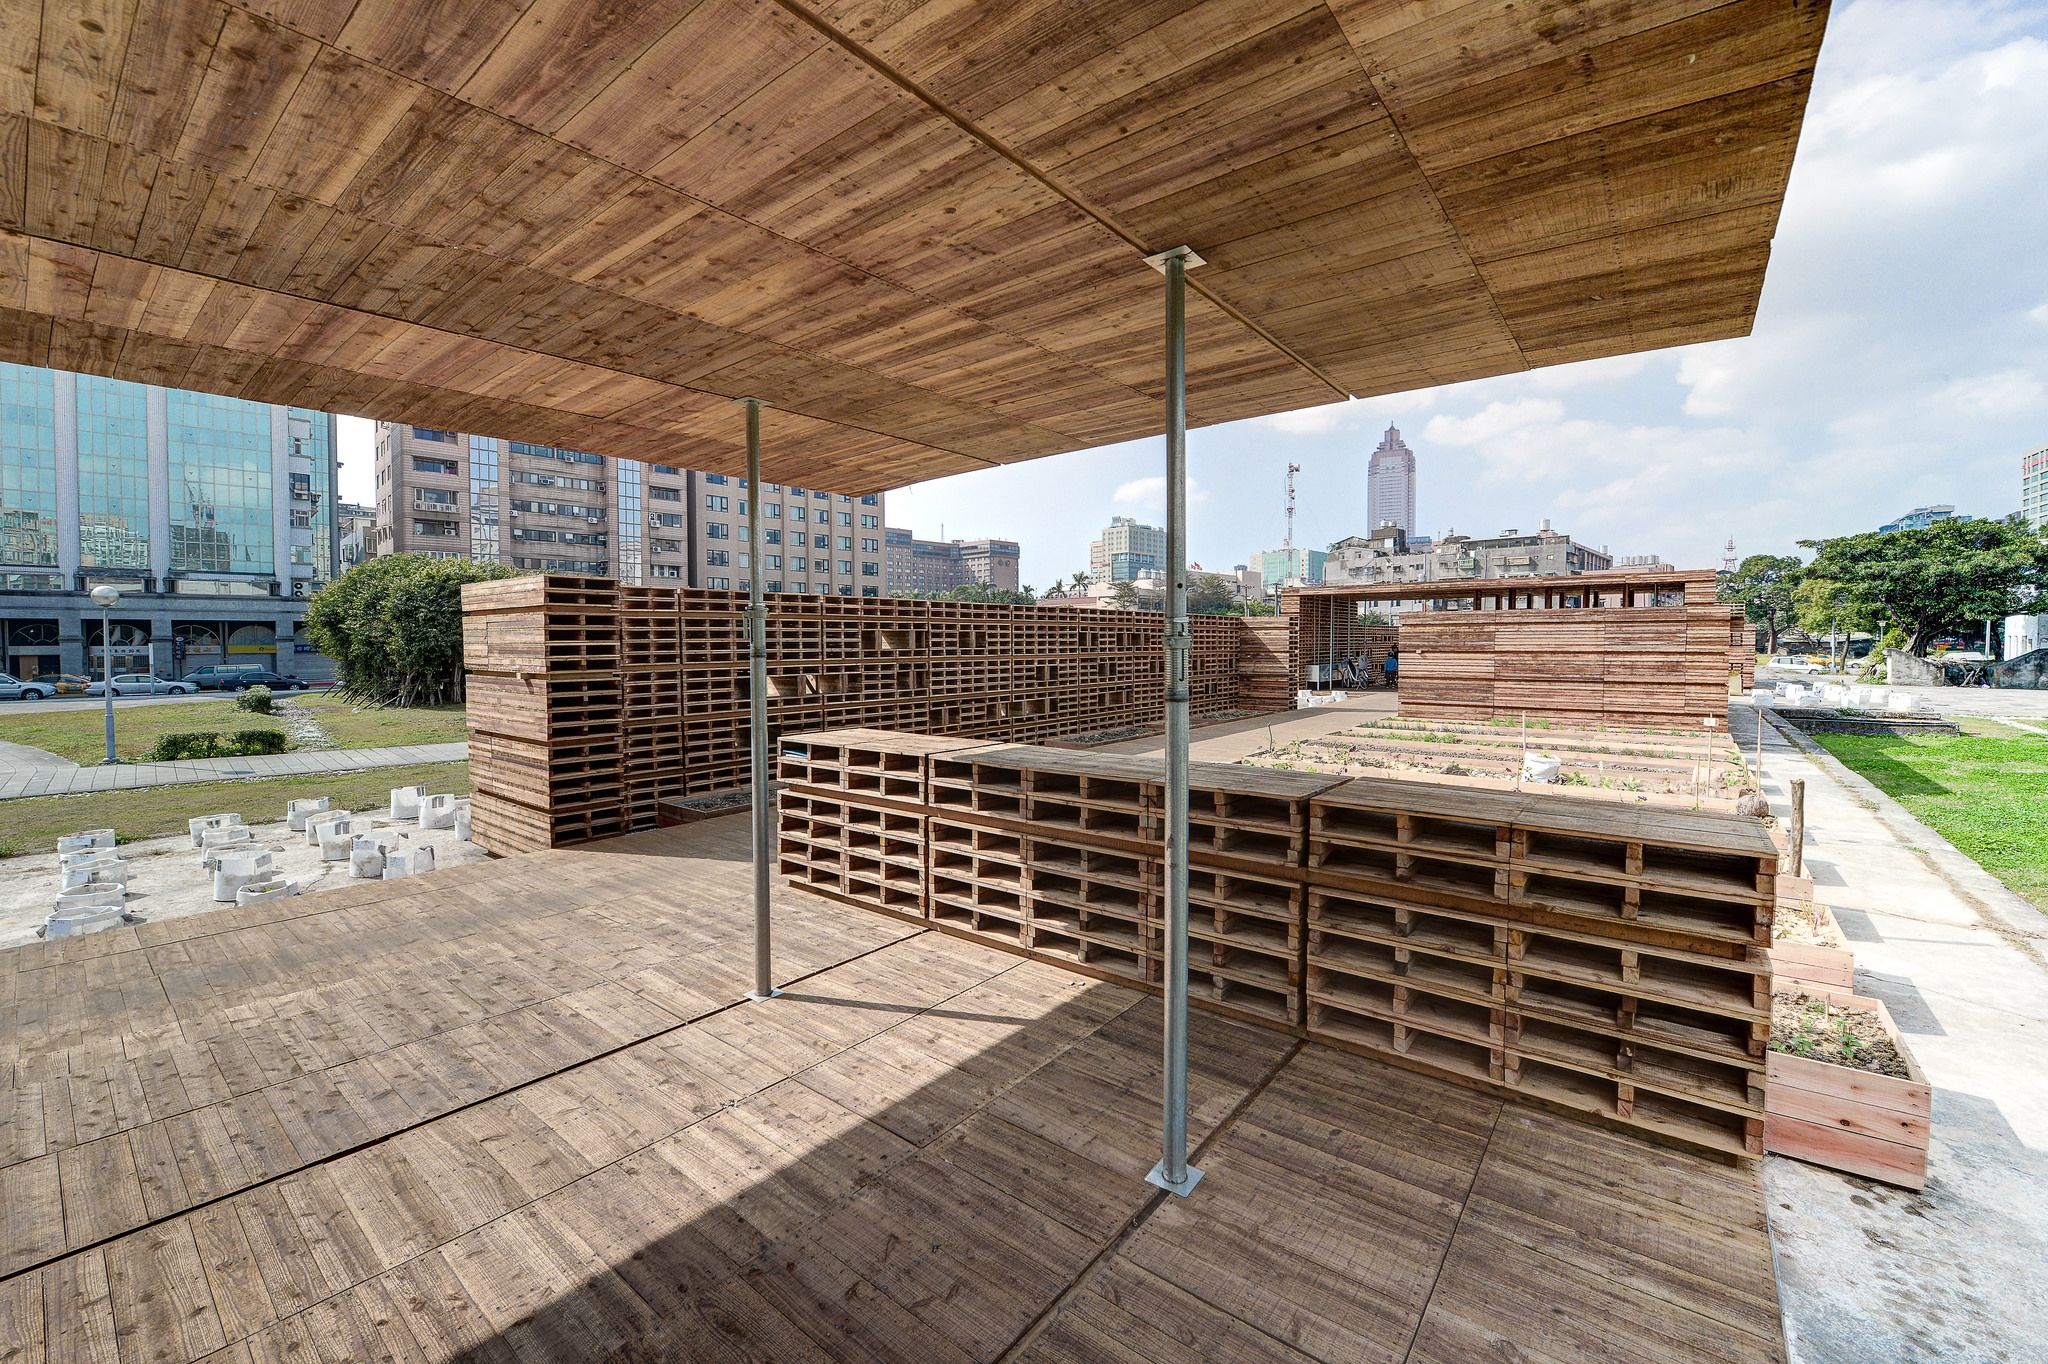 禾磊建築 - URS27 Next Play 華山綠工場 Green Factory - Photo 04.jpg   Flickr - Photo Sharing!